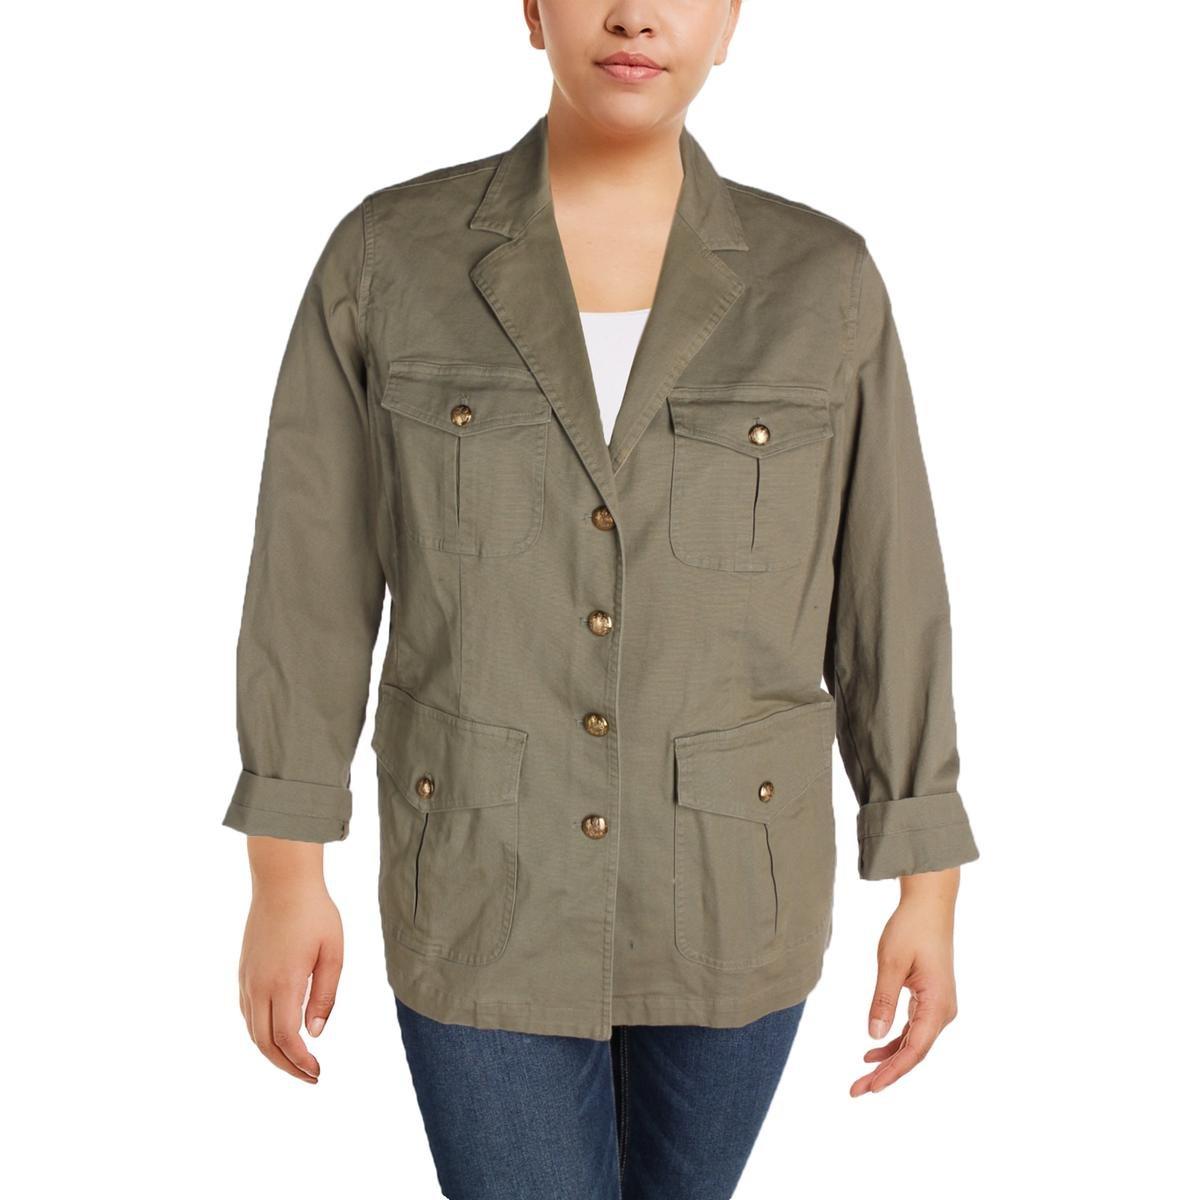 Lauren Ralph Lauren Womens Plus Braylin Long Sleeves Military Jacket Green 16W